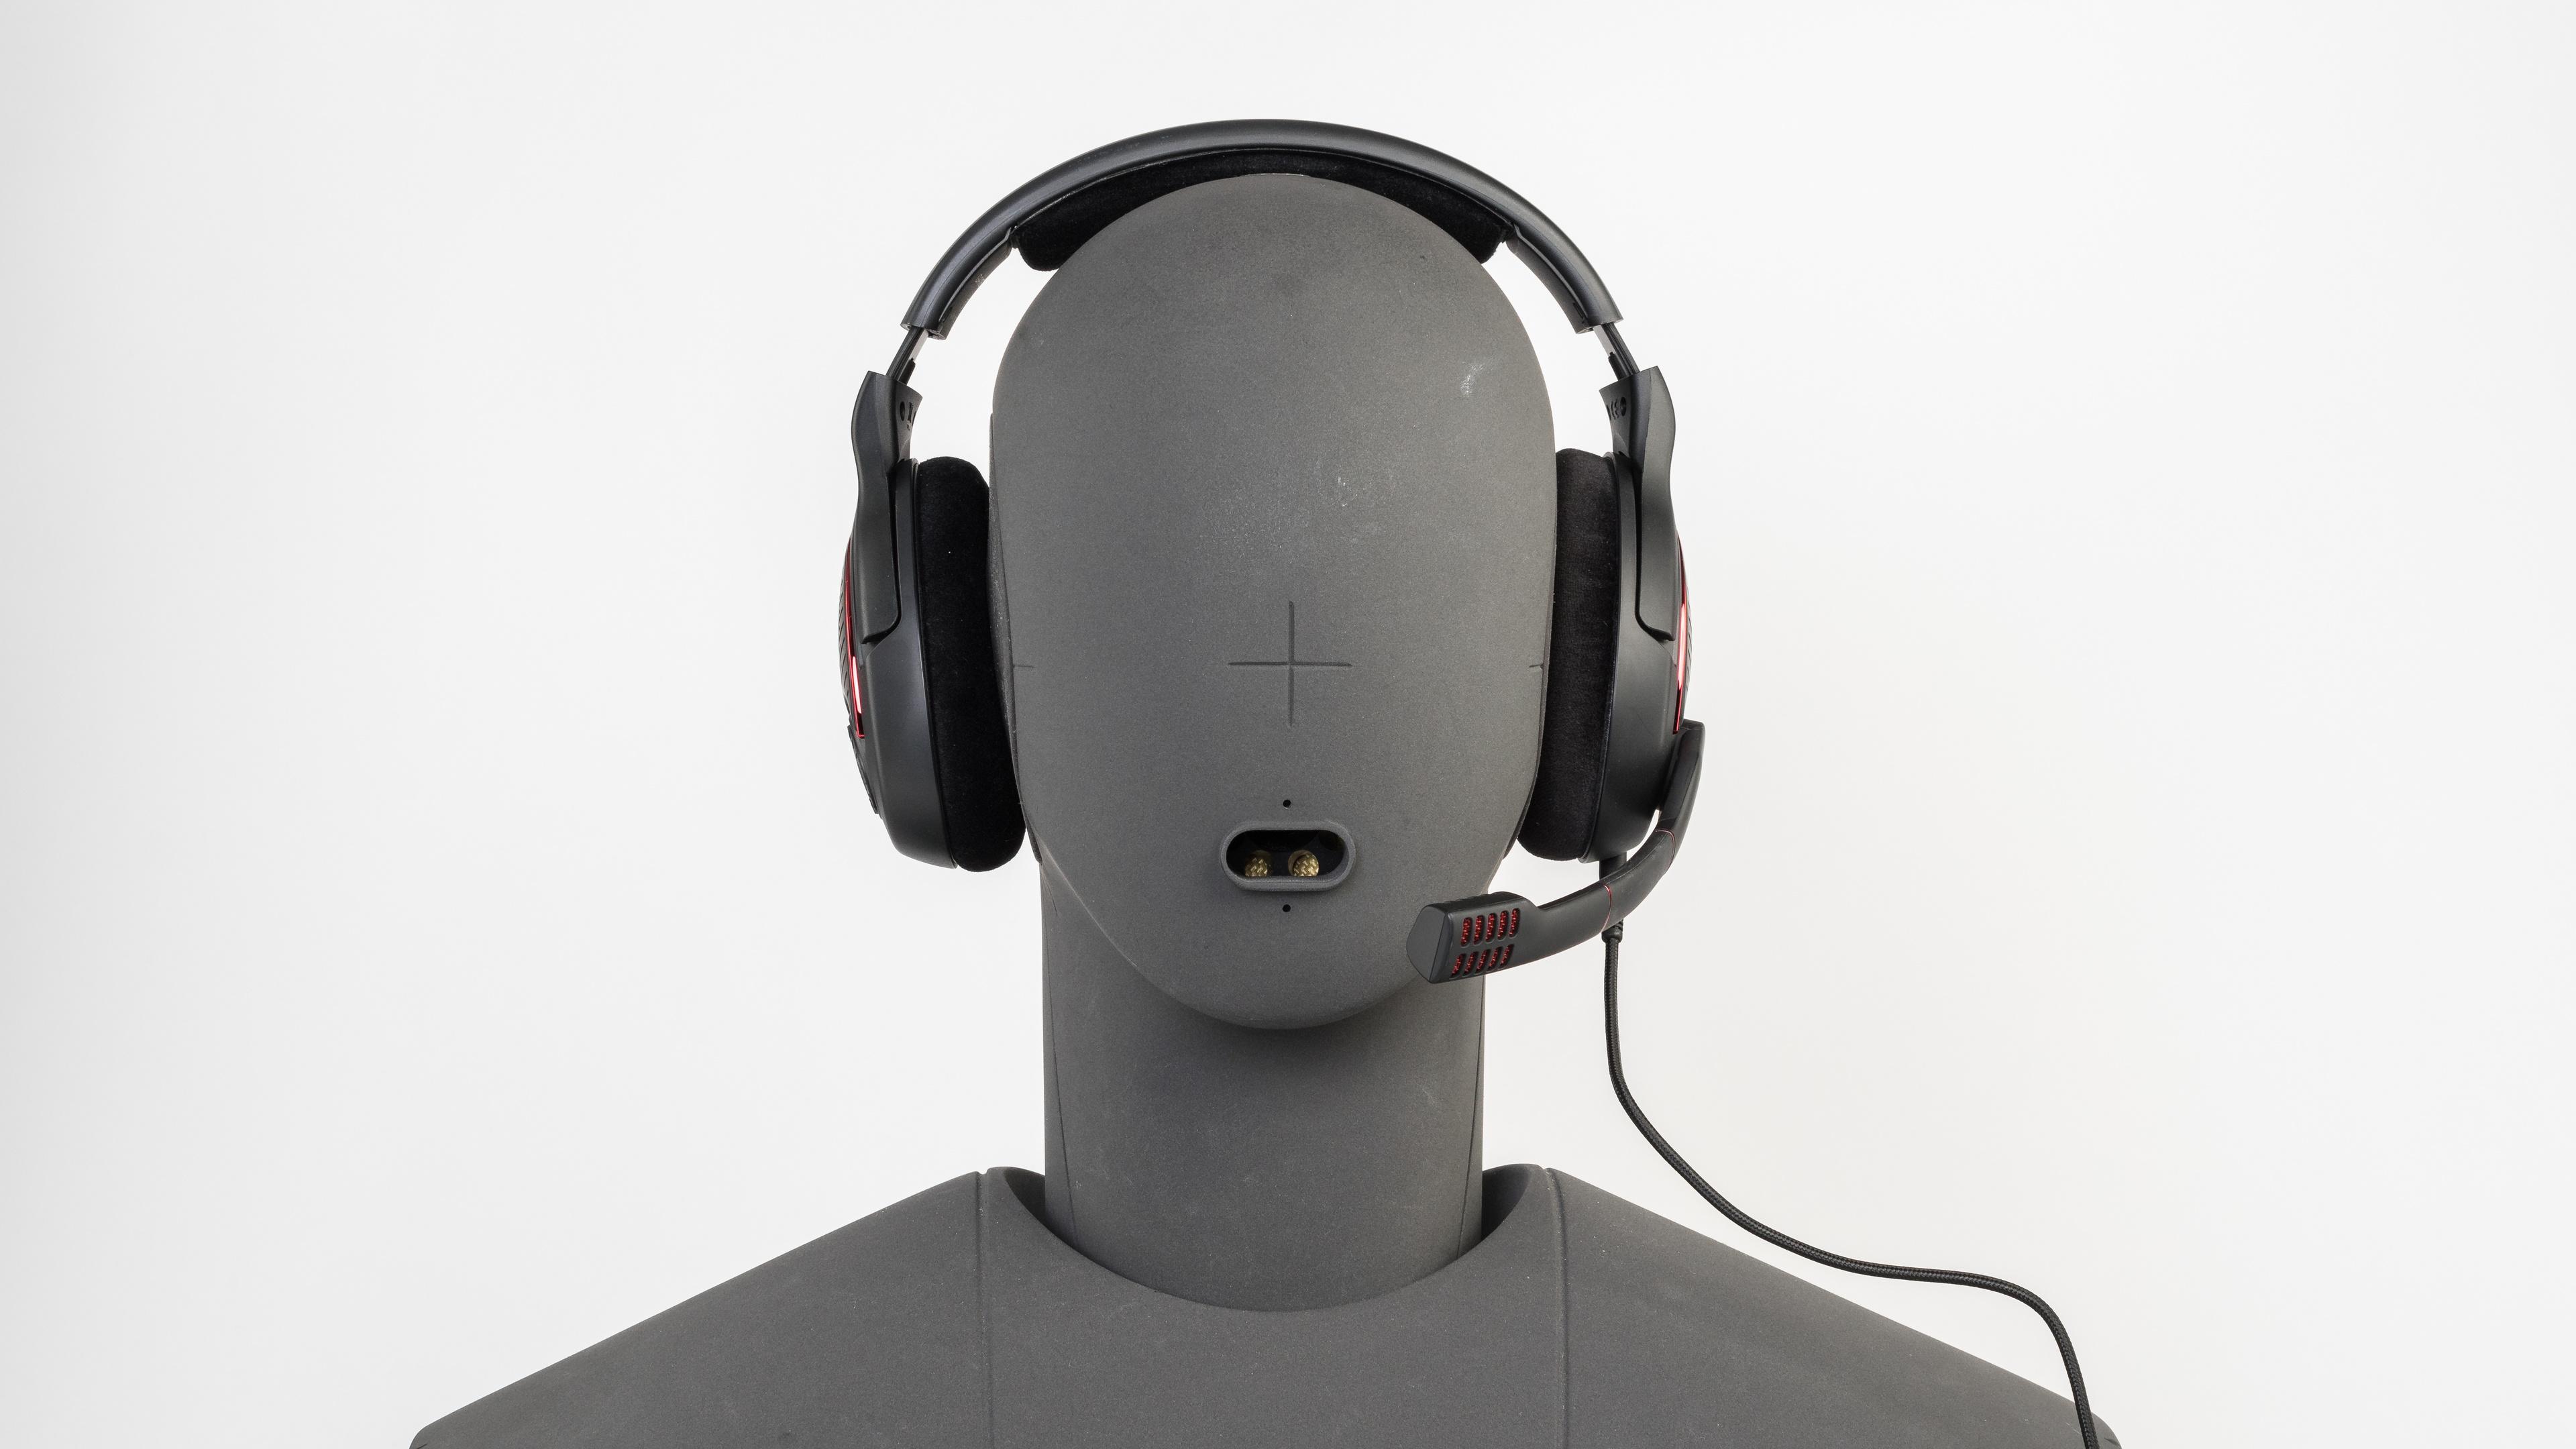 Rest in ear wireless headphones - headphones for running over ear